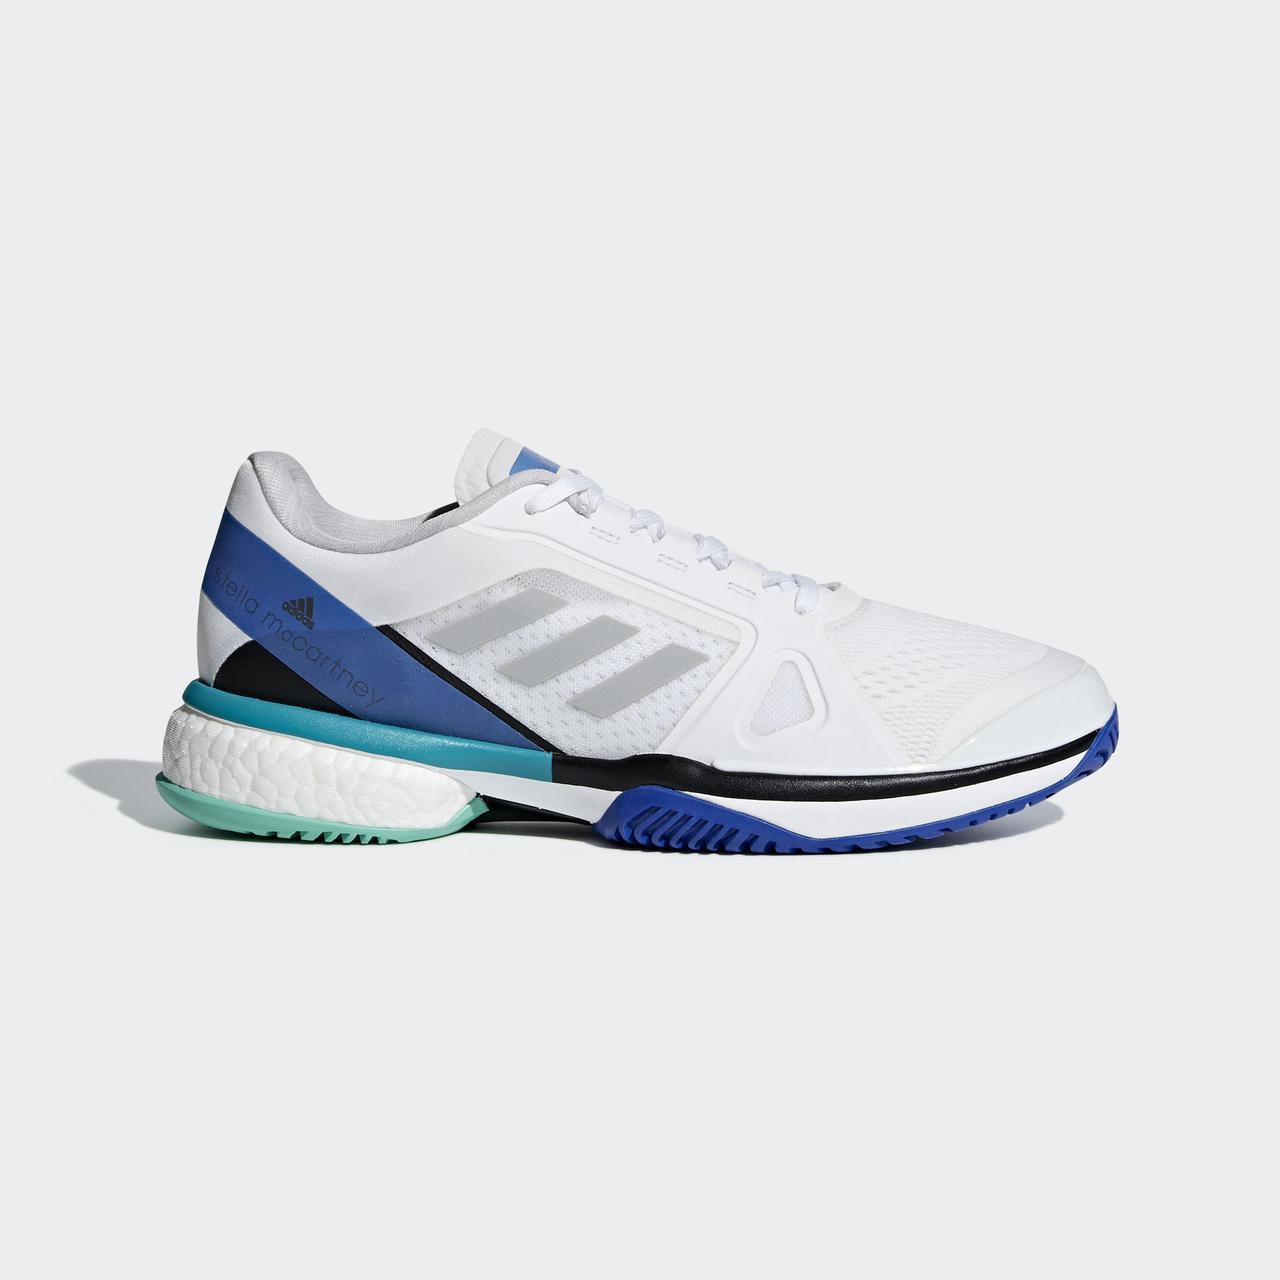 Женские кроссовки Adidas By Stella McCartney Barricade Boost (Артикул: AC8258)